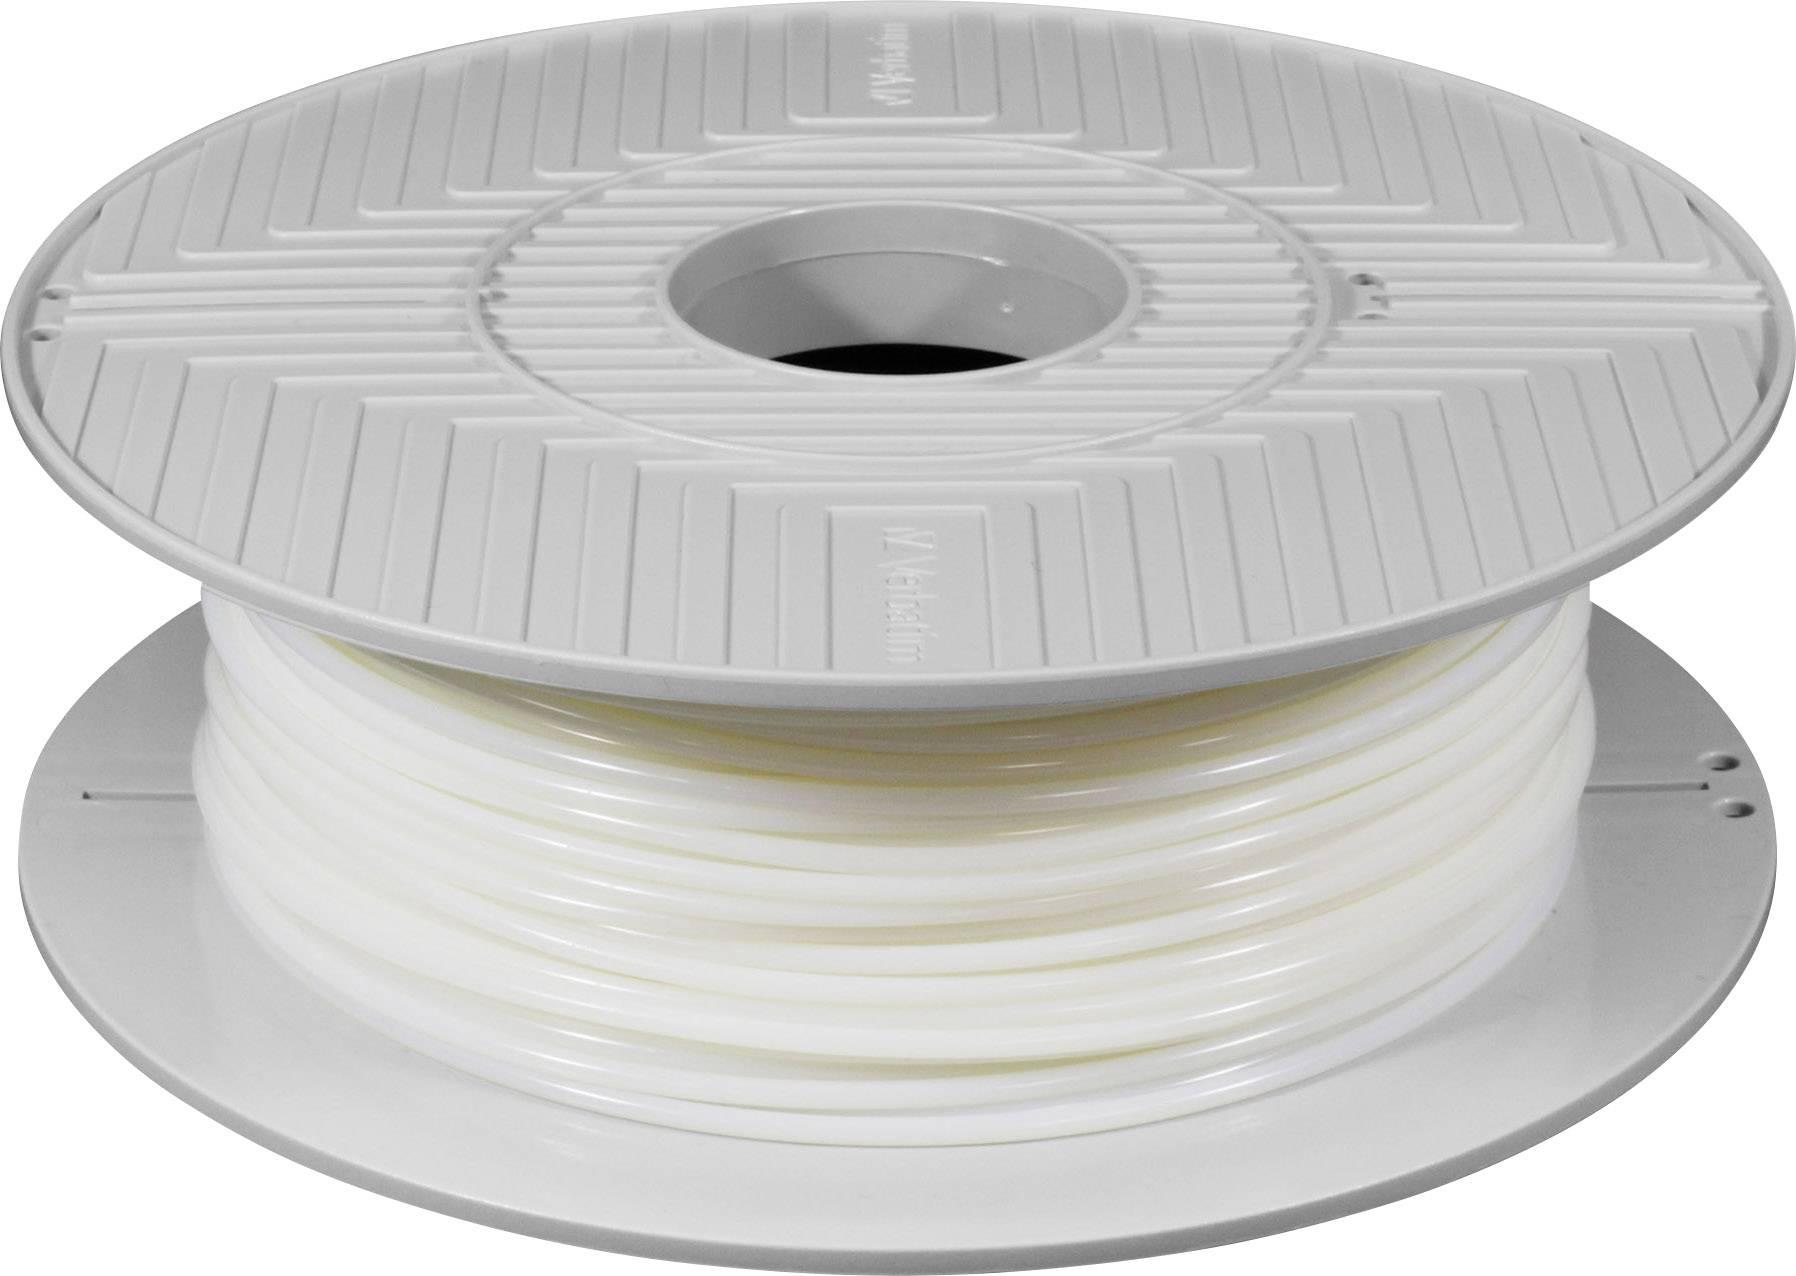 tpe White 500 G 2.85mm High Quality Verbatim 55501 Primalloy Thermoplastic Elastomer